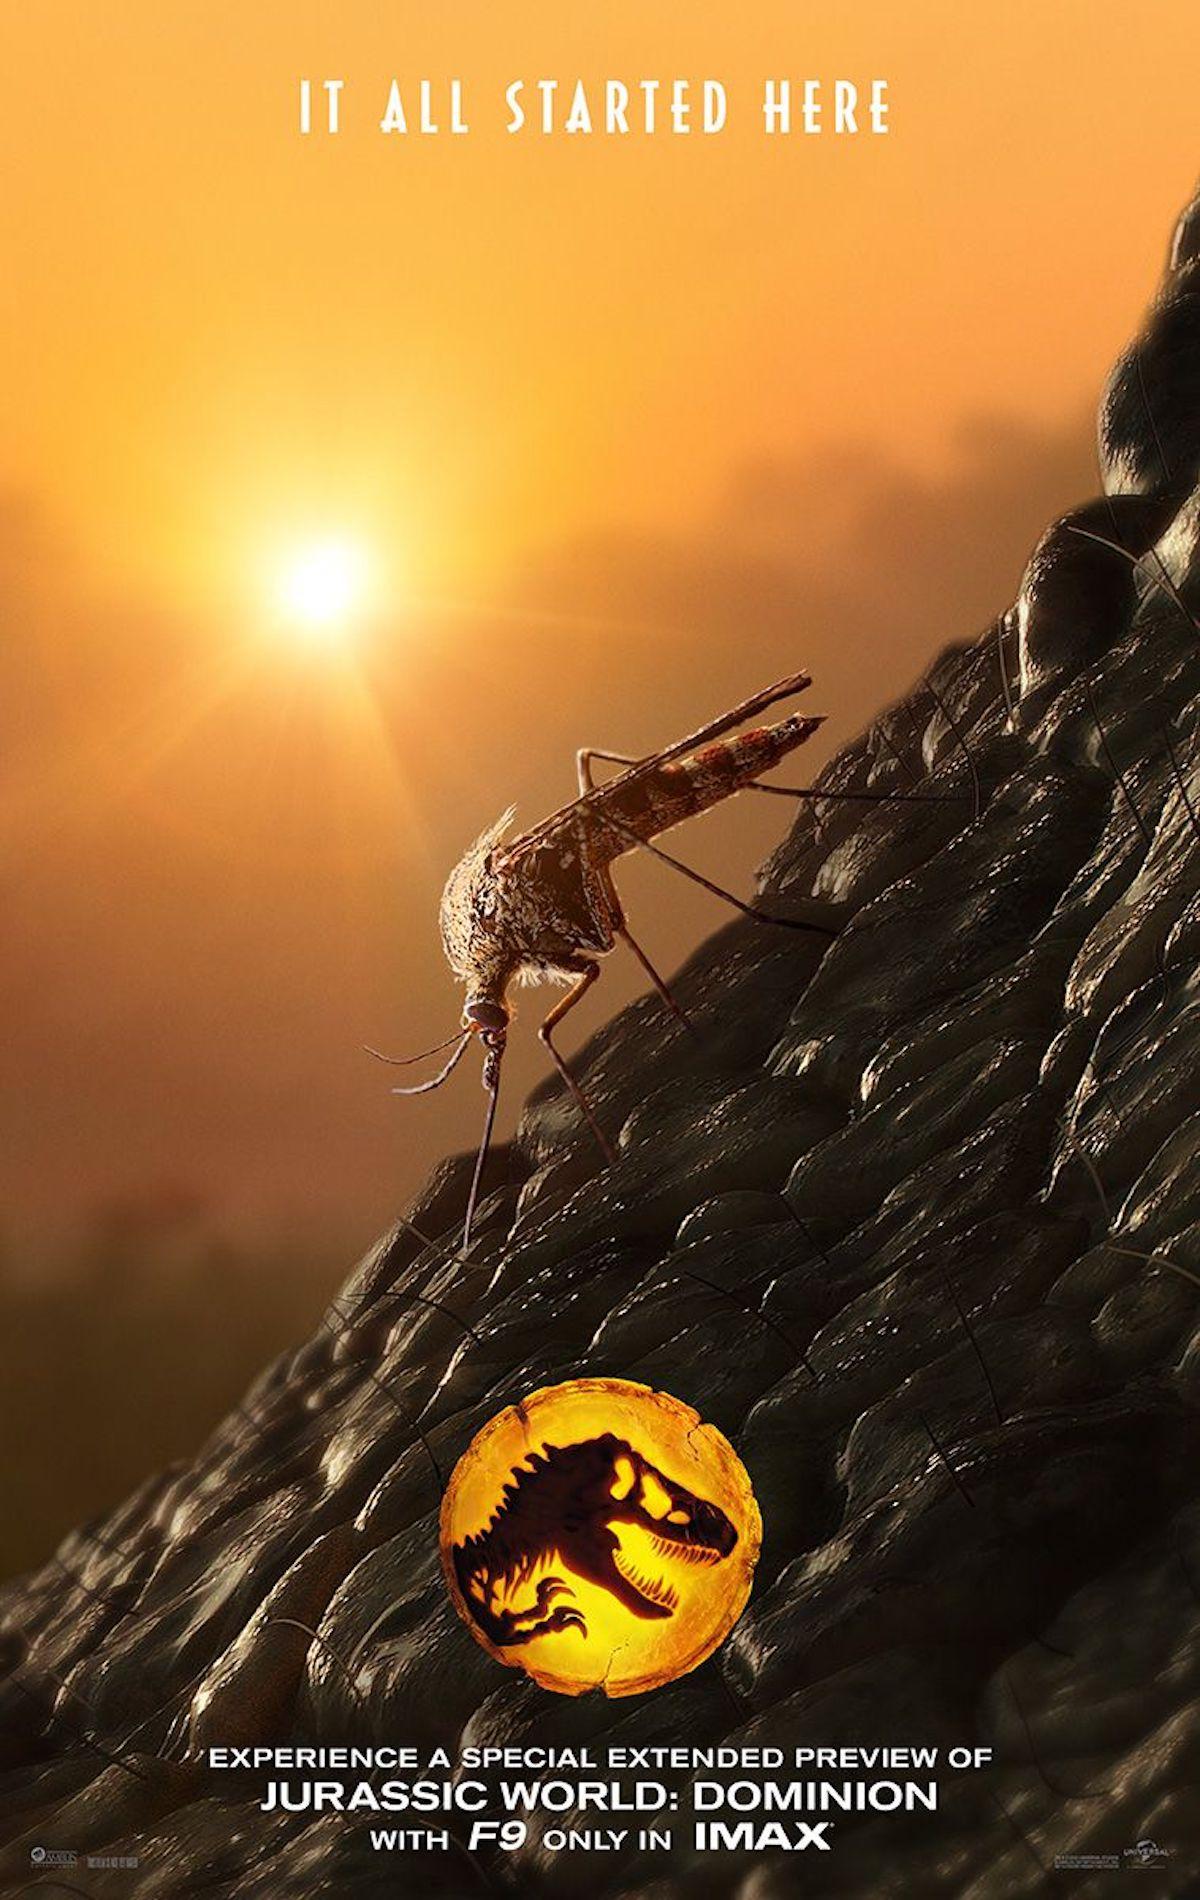 Jurassic World: Dominion IMAX preview poster